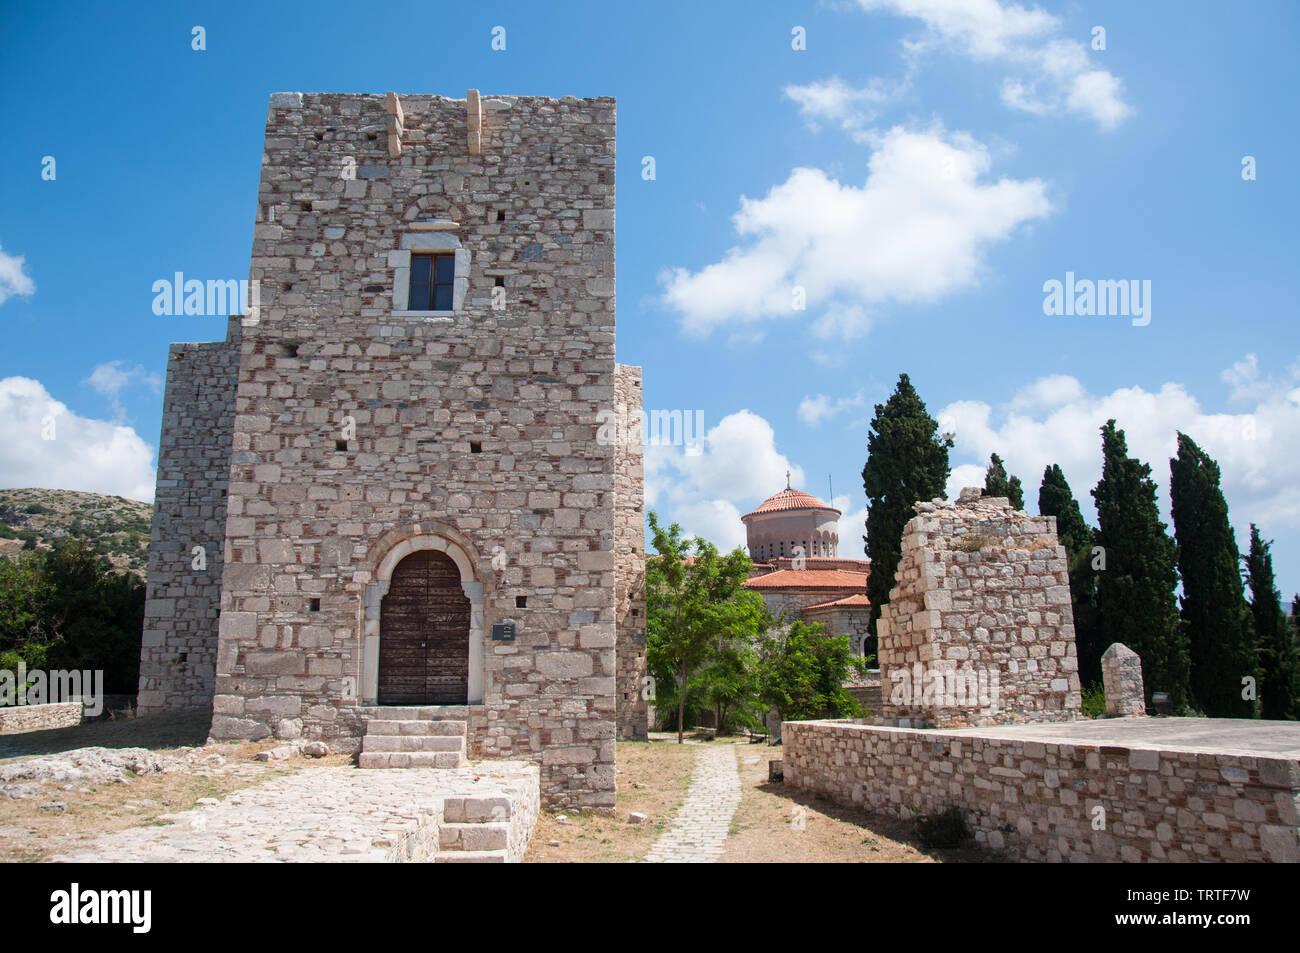 Castle of Lykourgos Logothetis on Samos island in the Aegean Sea, Greece Stock Photo